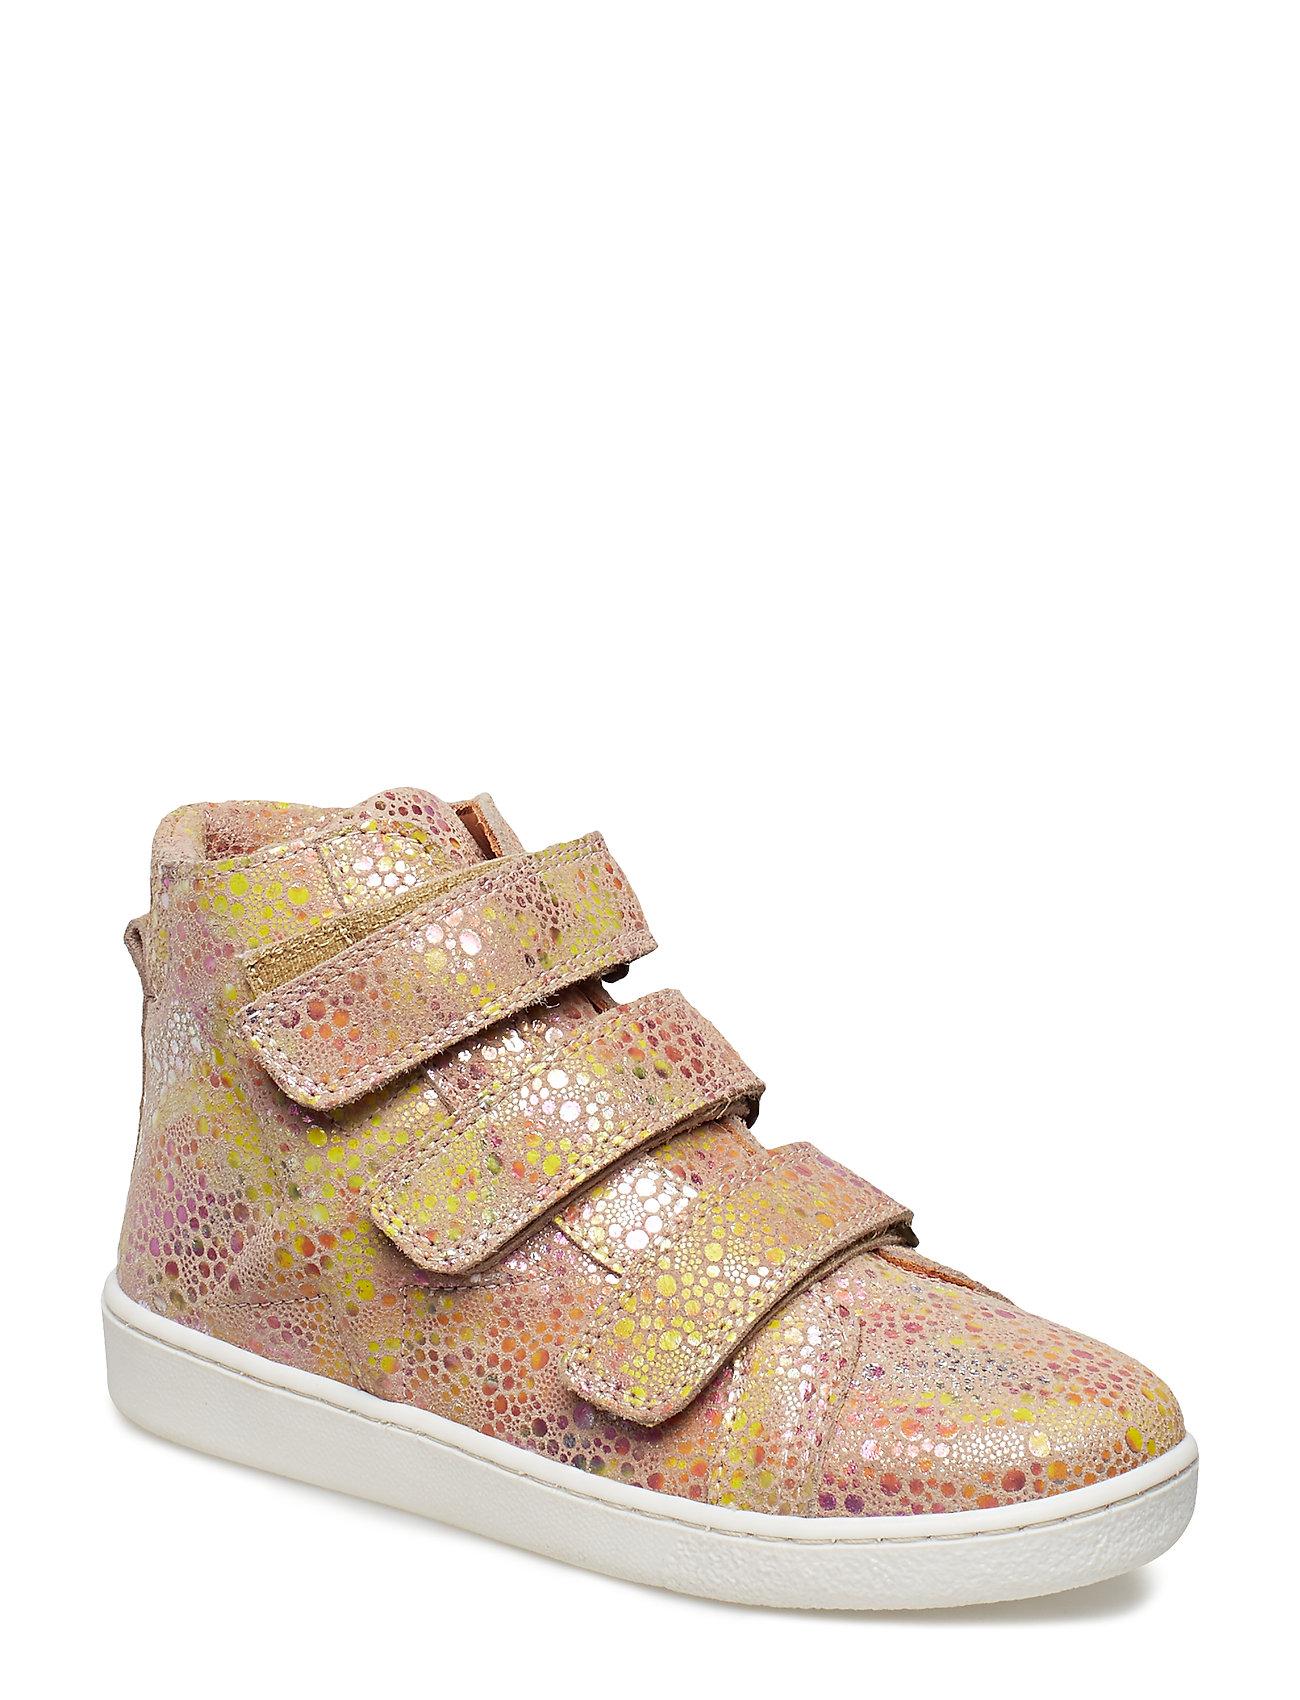 Bisgaard Velcro shoes - LEMON